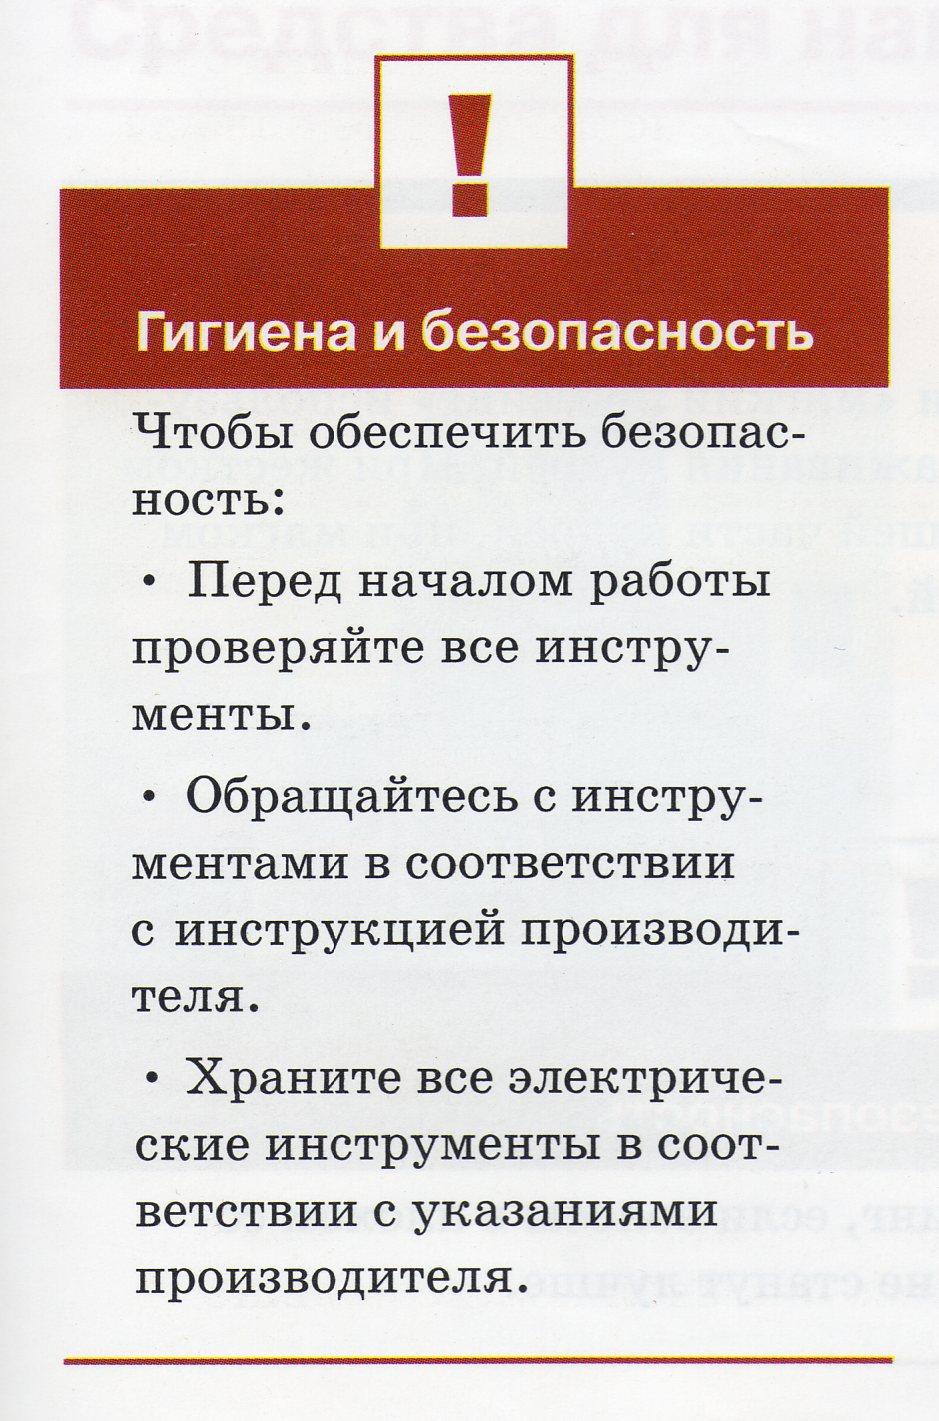 H:\открытый урок\ТБ горячим способом\img014.jpg